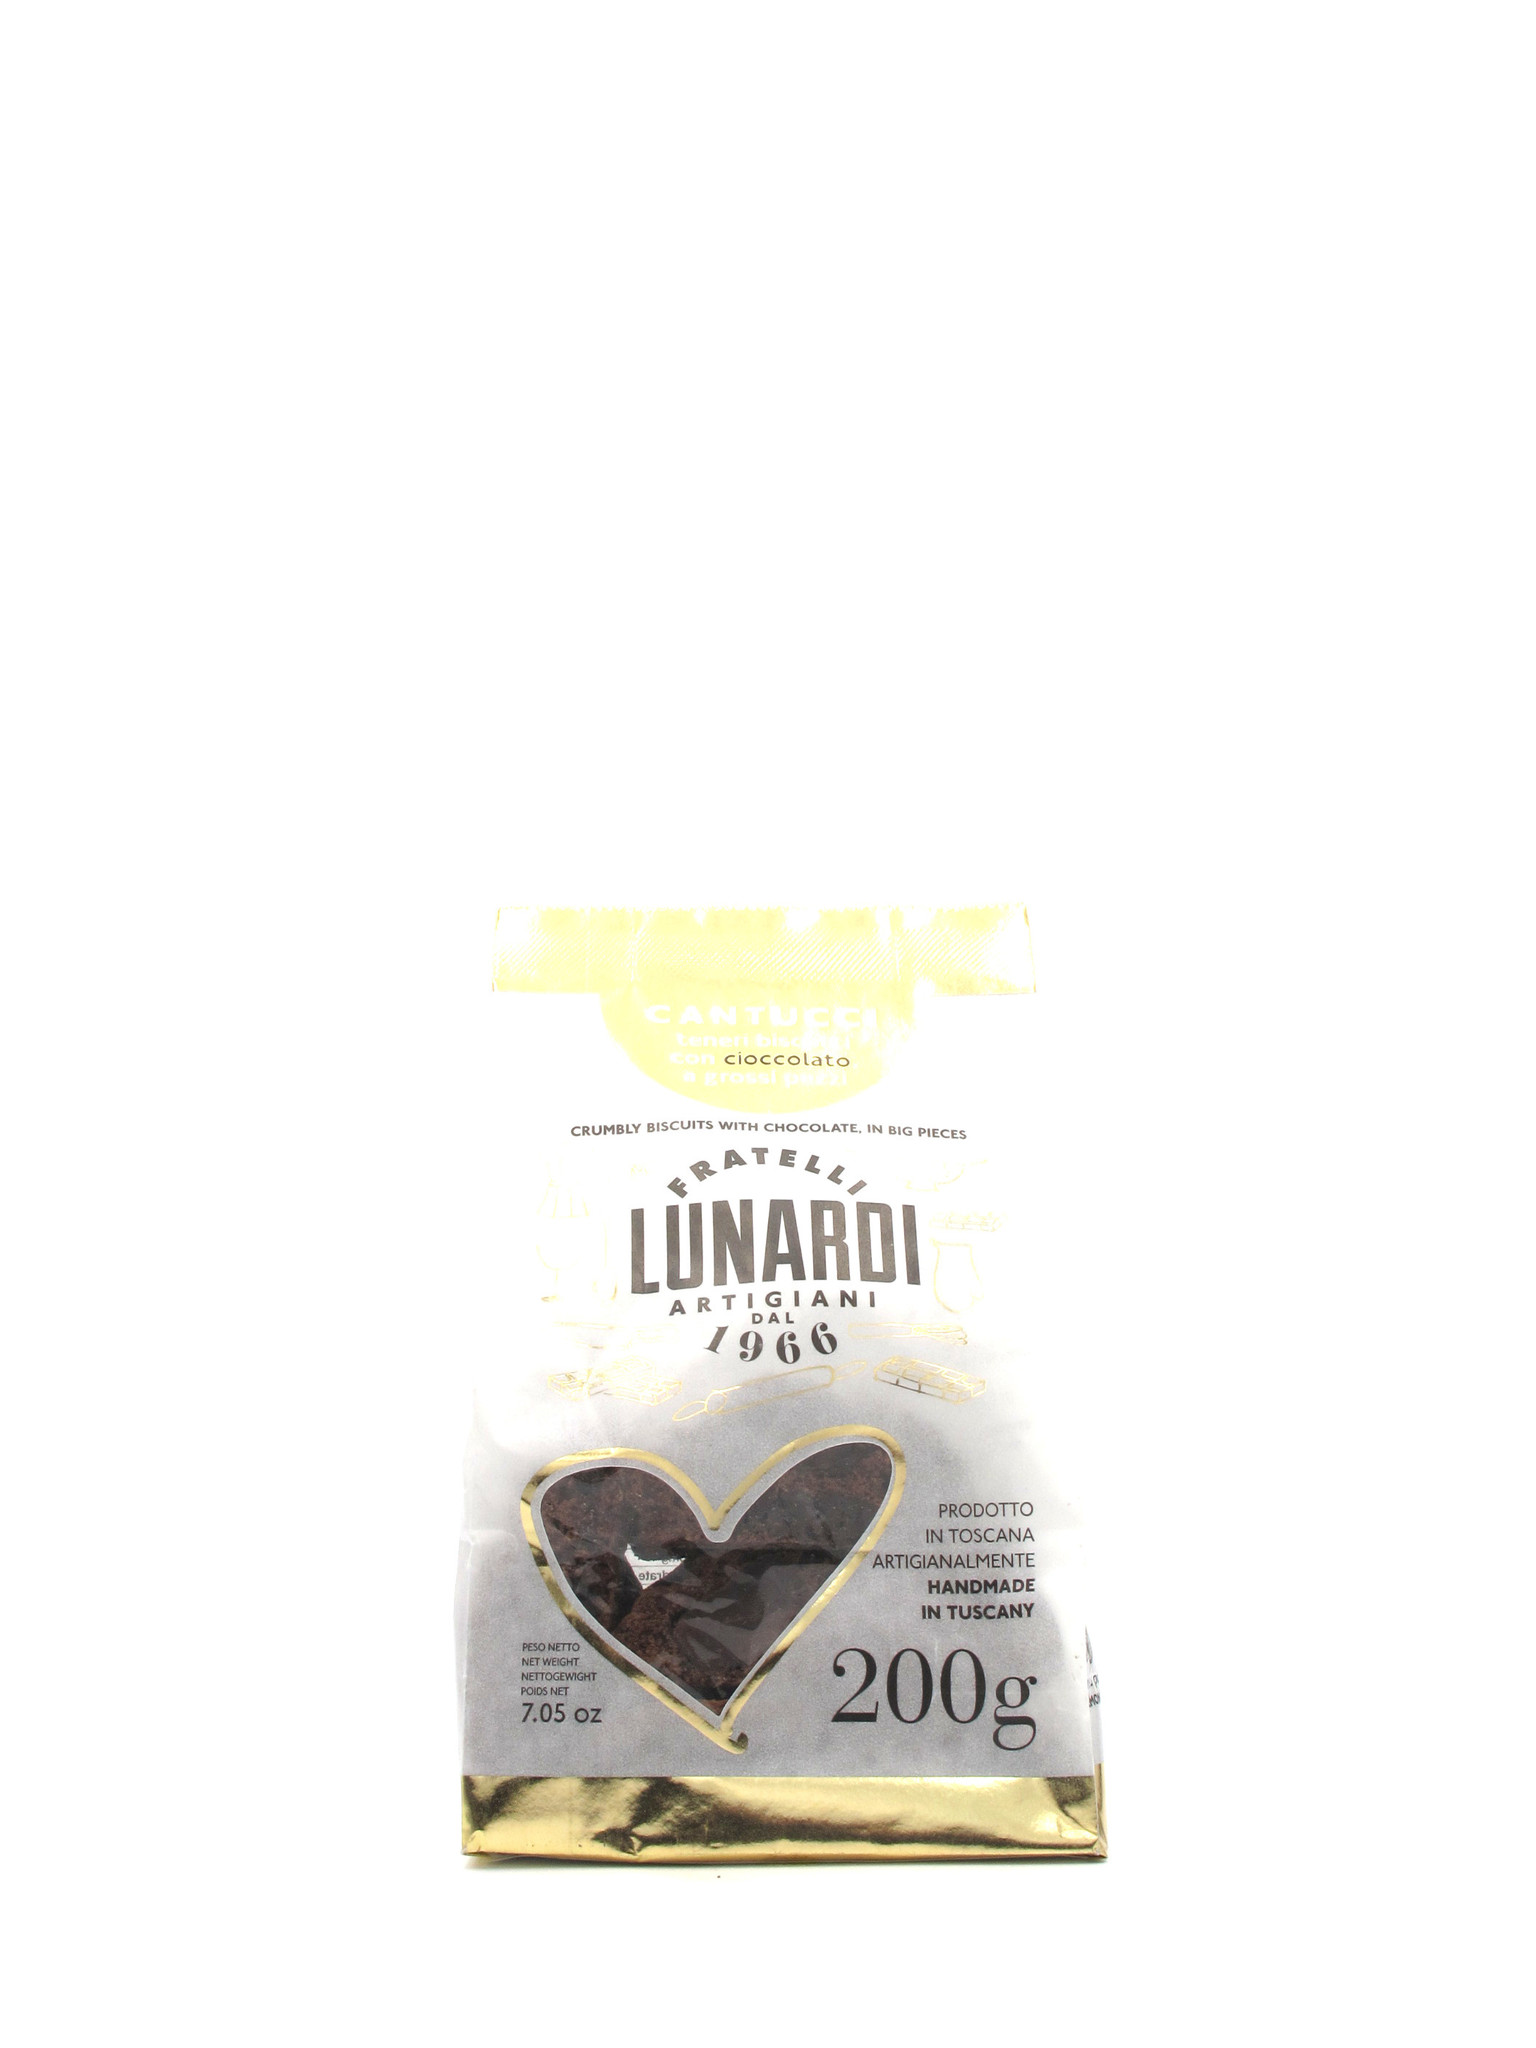 Lunardi Fraetelli Lunardi Chocolate Biscotti 200gr